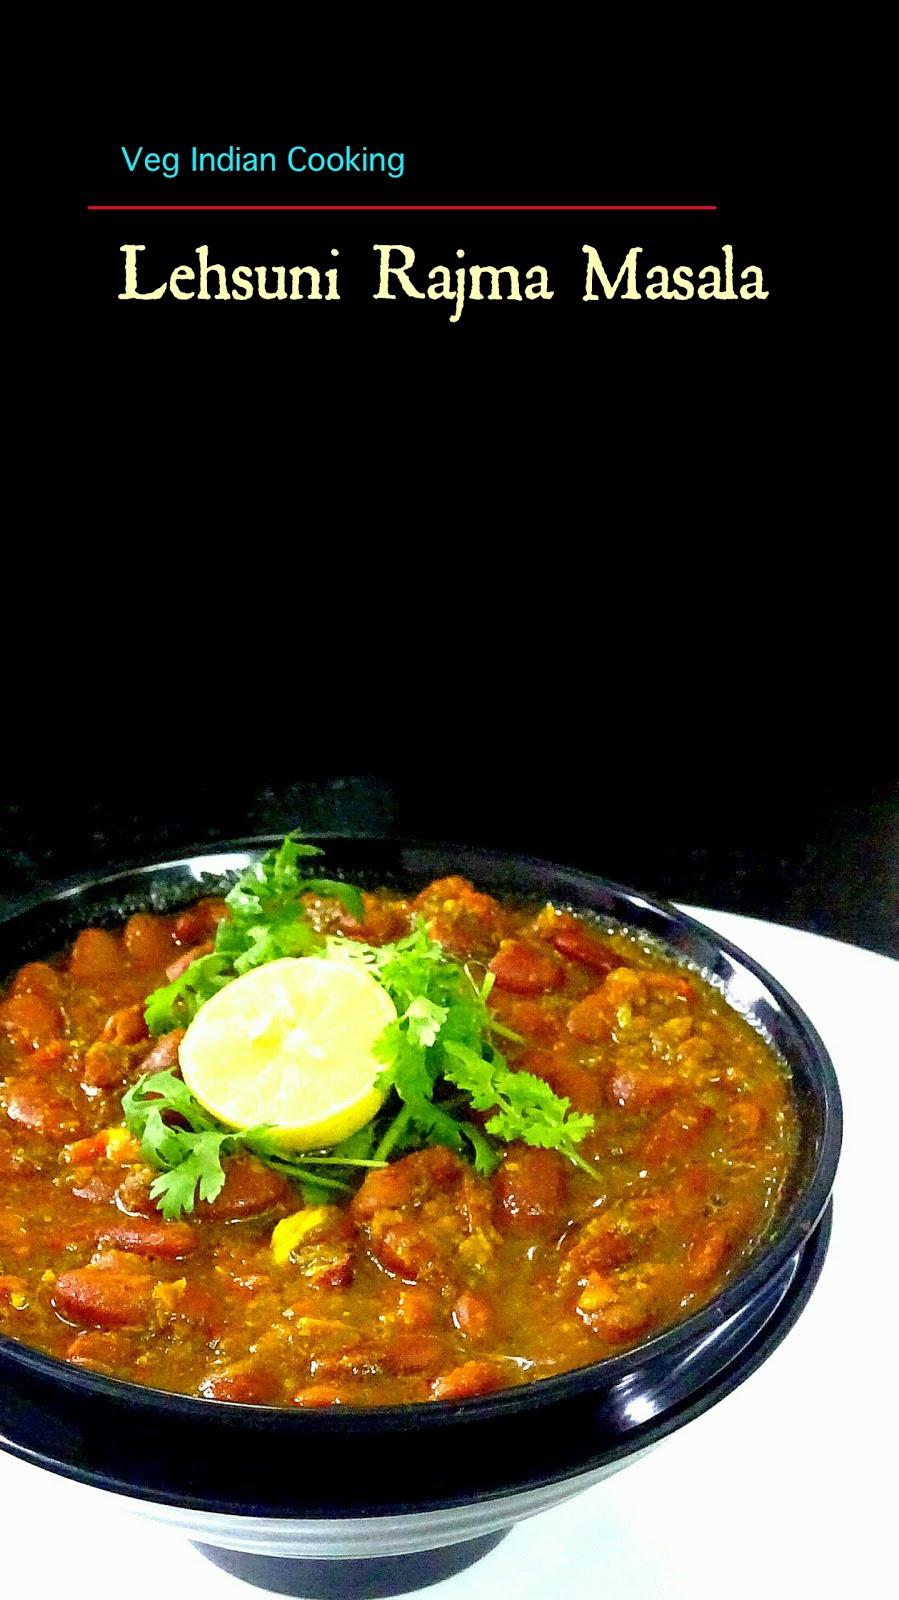 Veg indian cooking lehsuni rajma masala thursday august 11 2016 forumfinder Choice Image